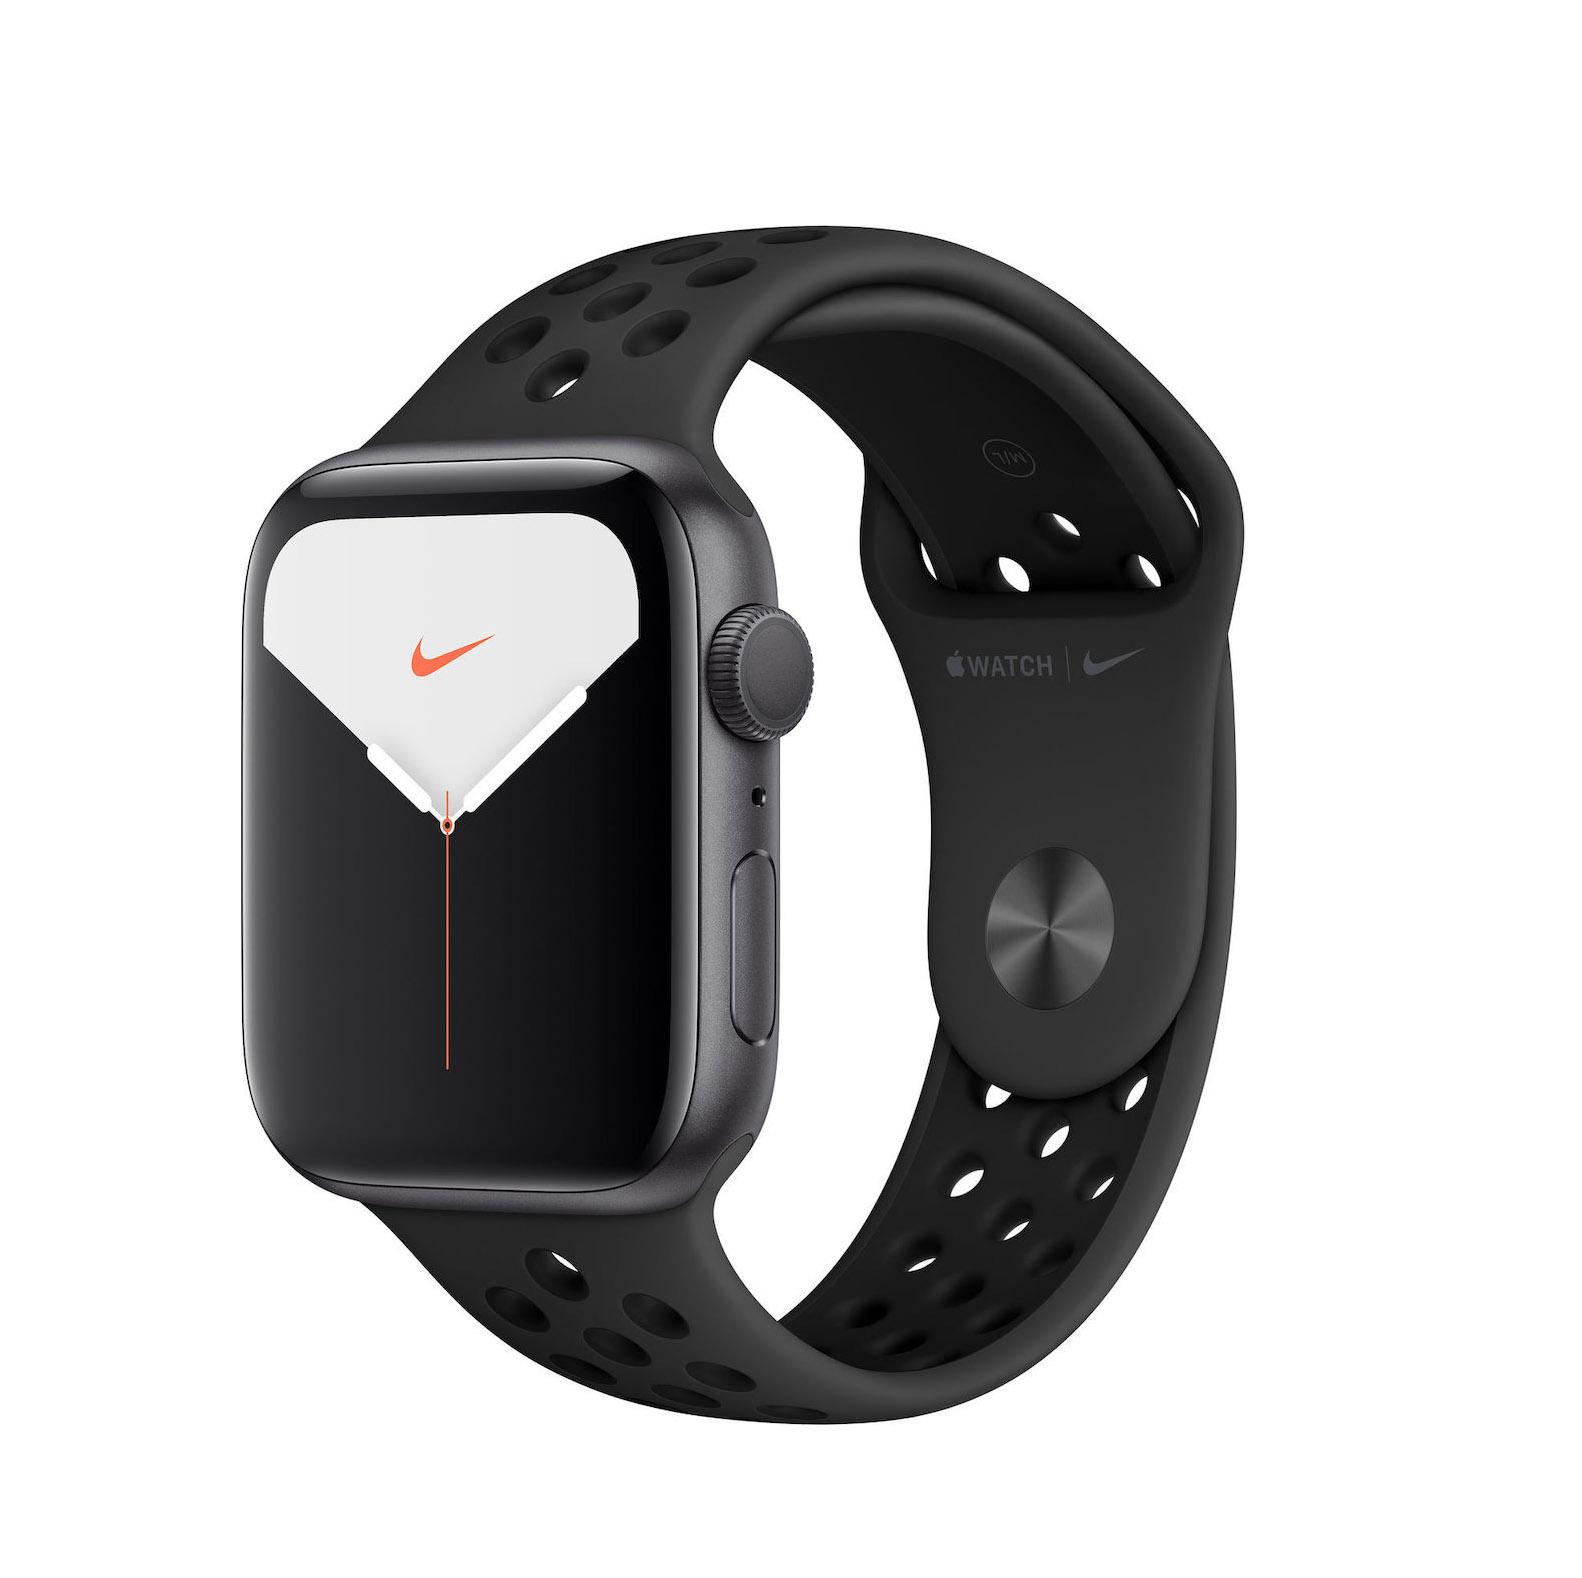 Apple Watch Series 5 Nike 44mm Aluminium Space Grey Black Sport Band MX3W2 Πληρωμή έως 24 δόσεις